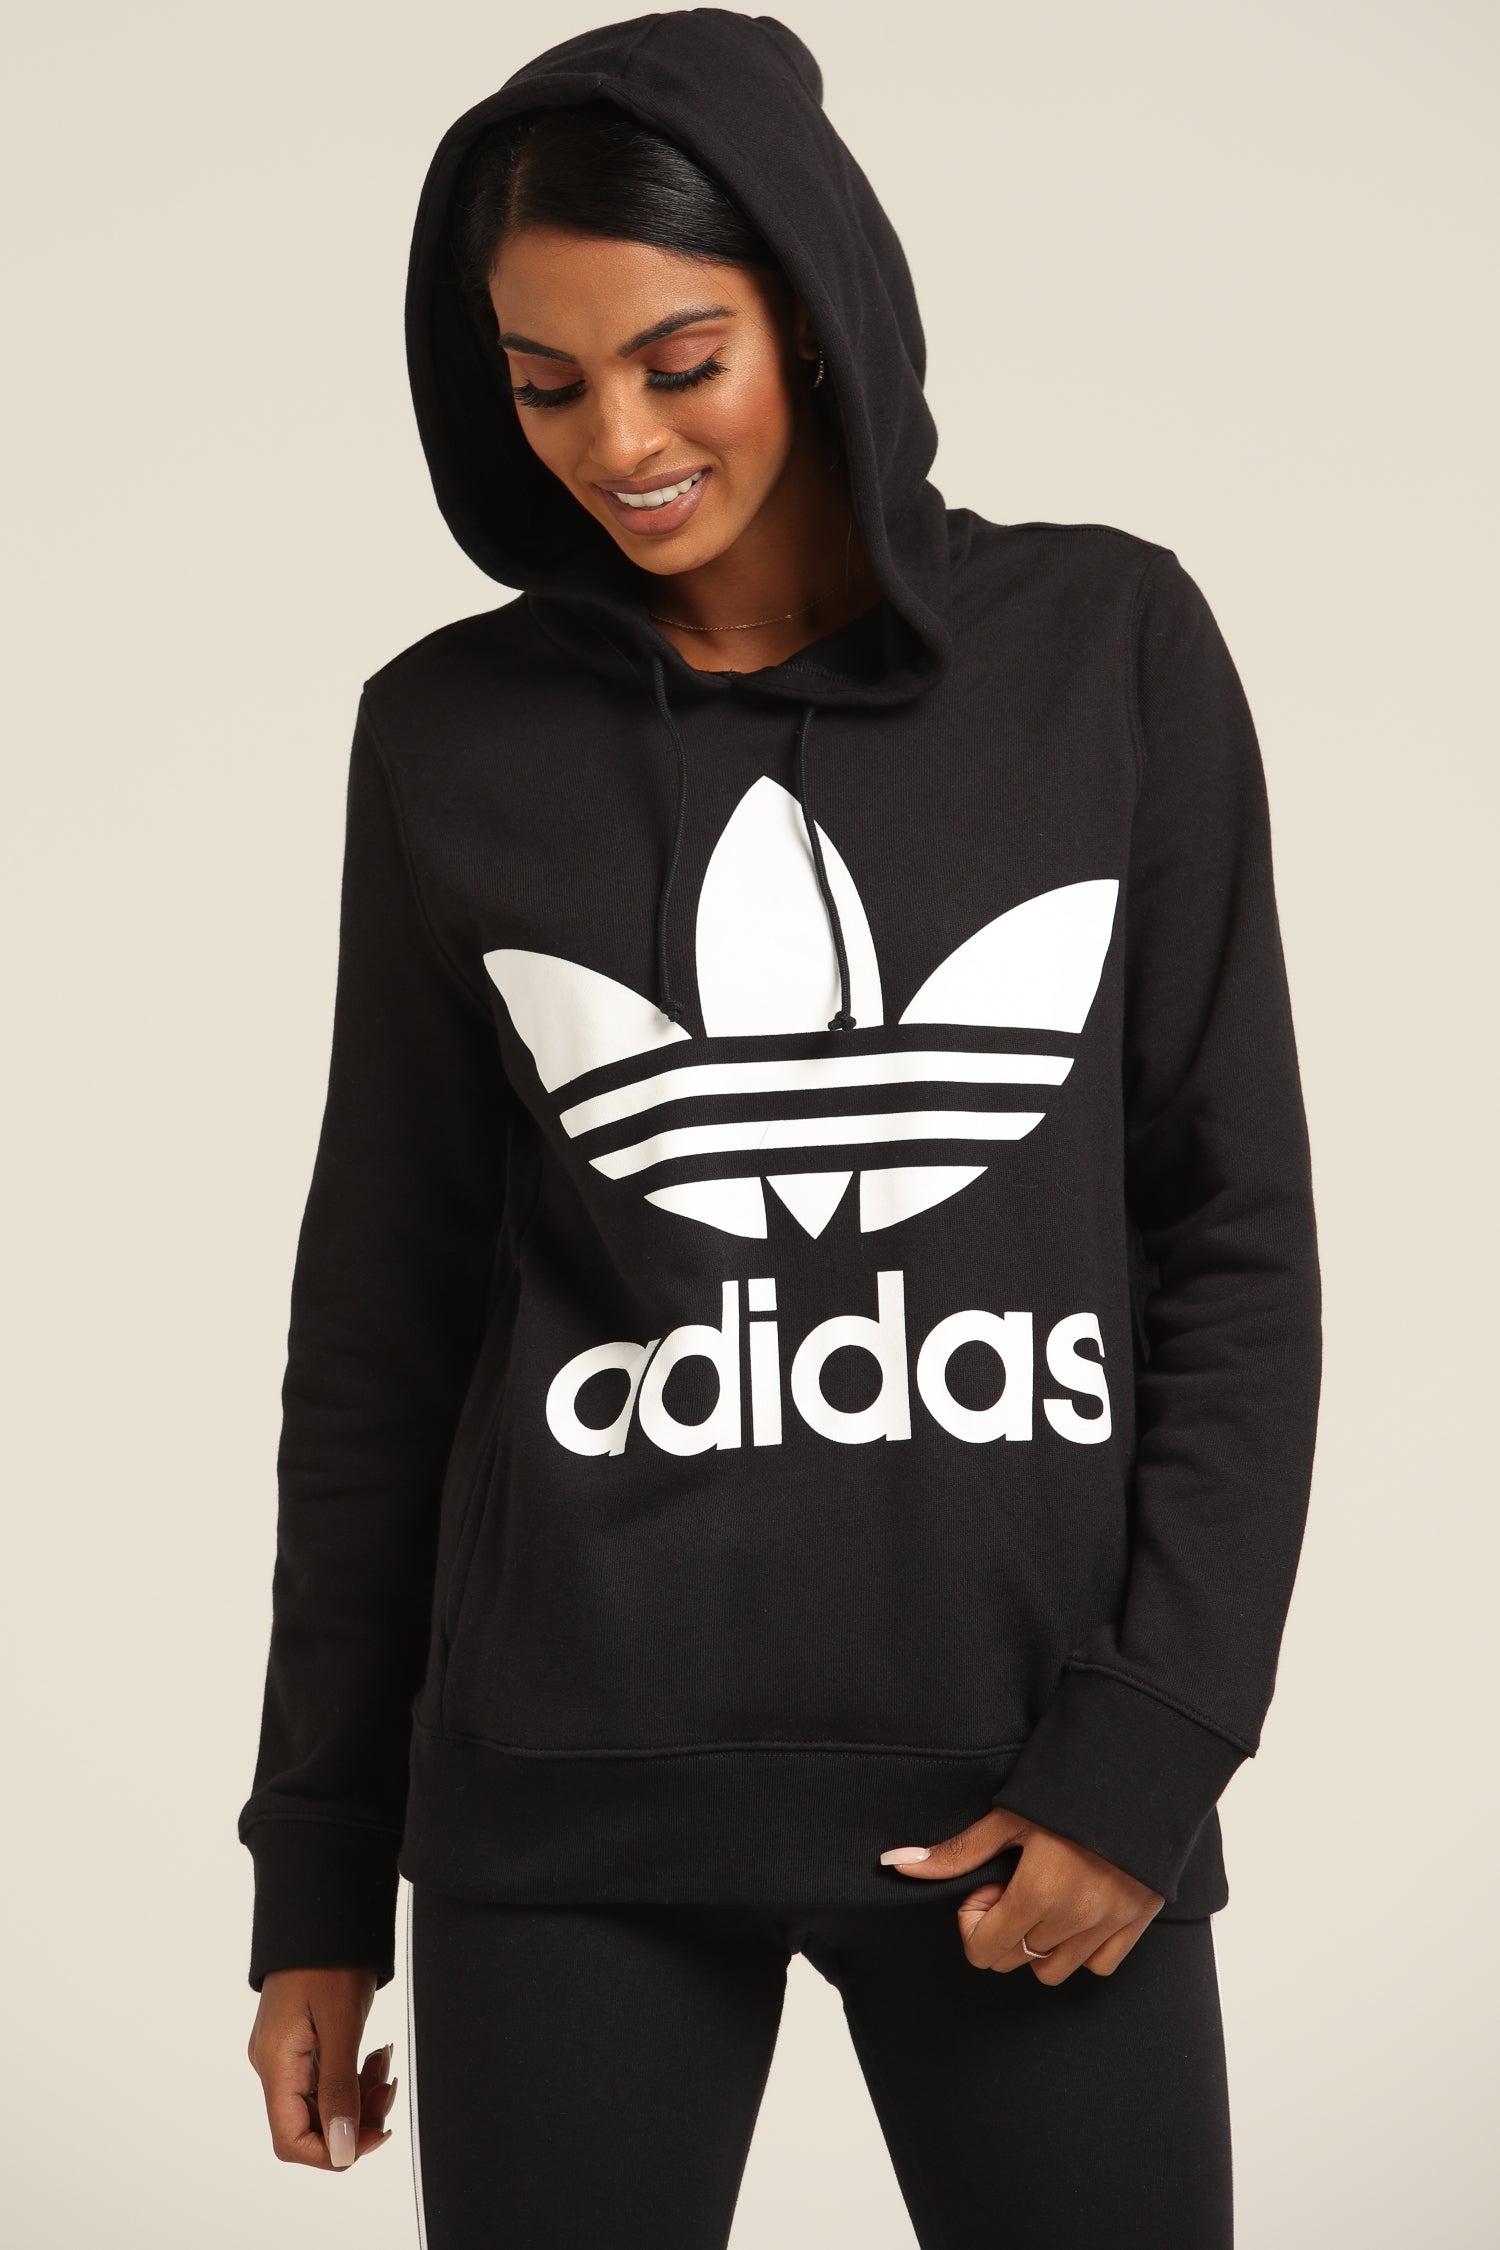 adidas Trefoil Sports Hoodie for Women Black